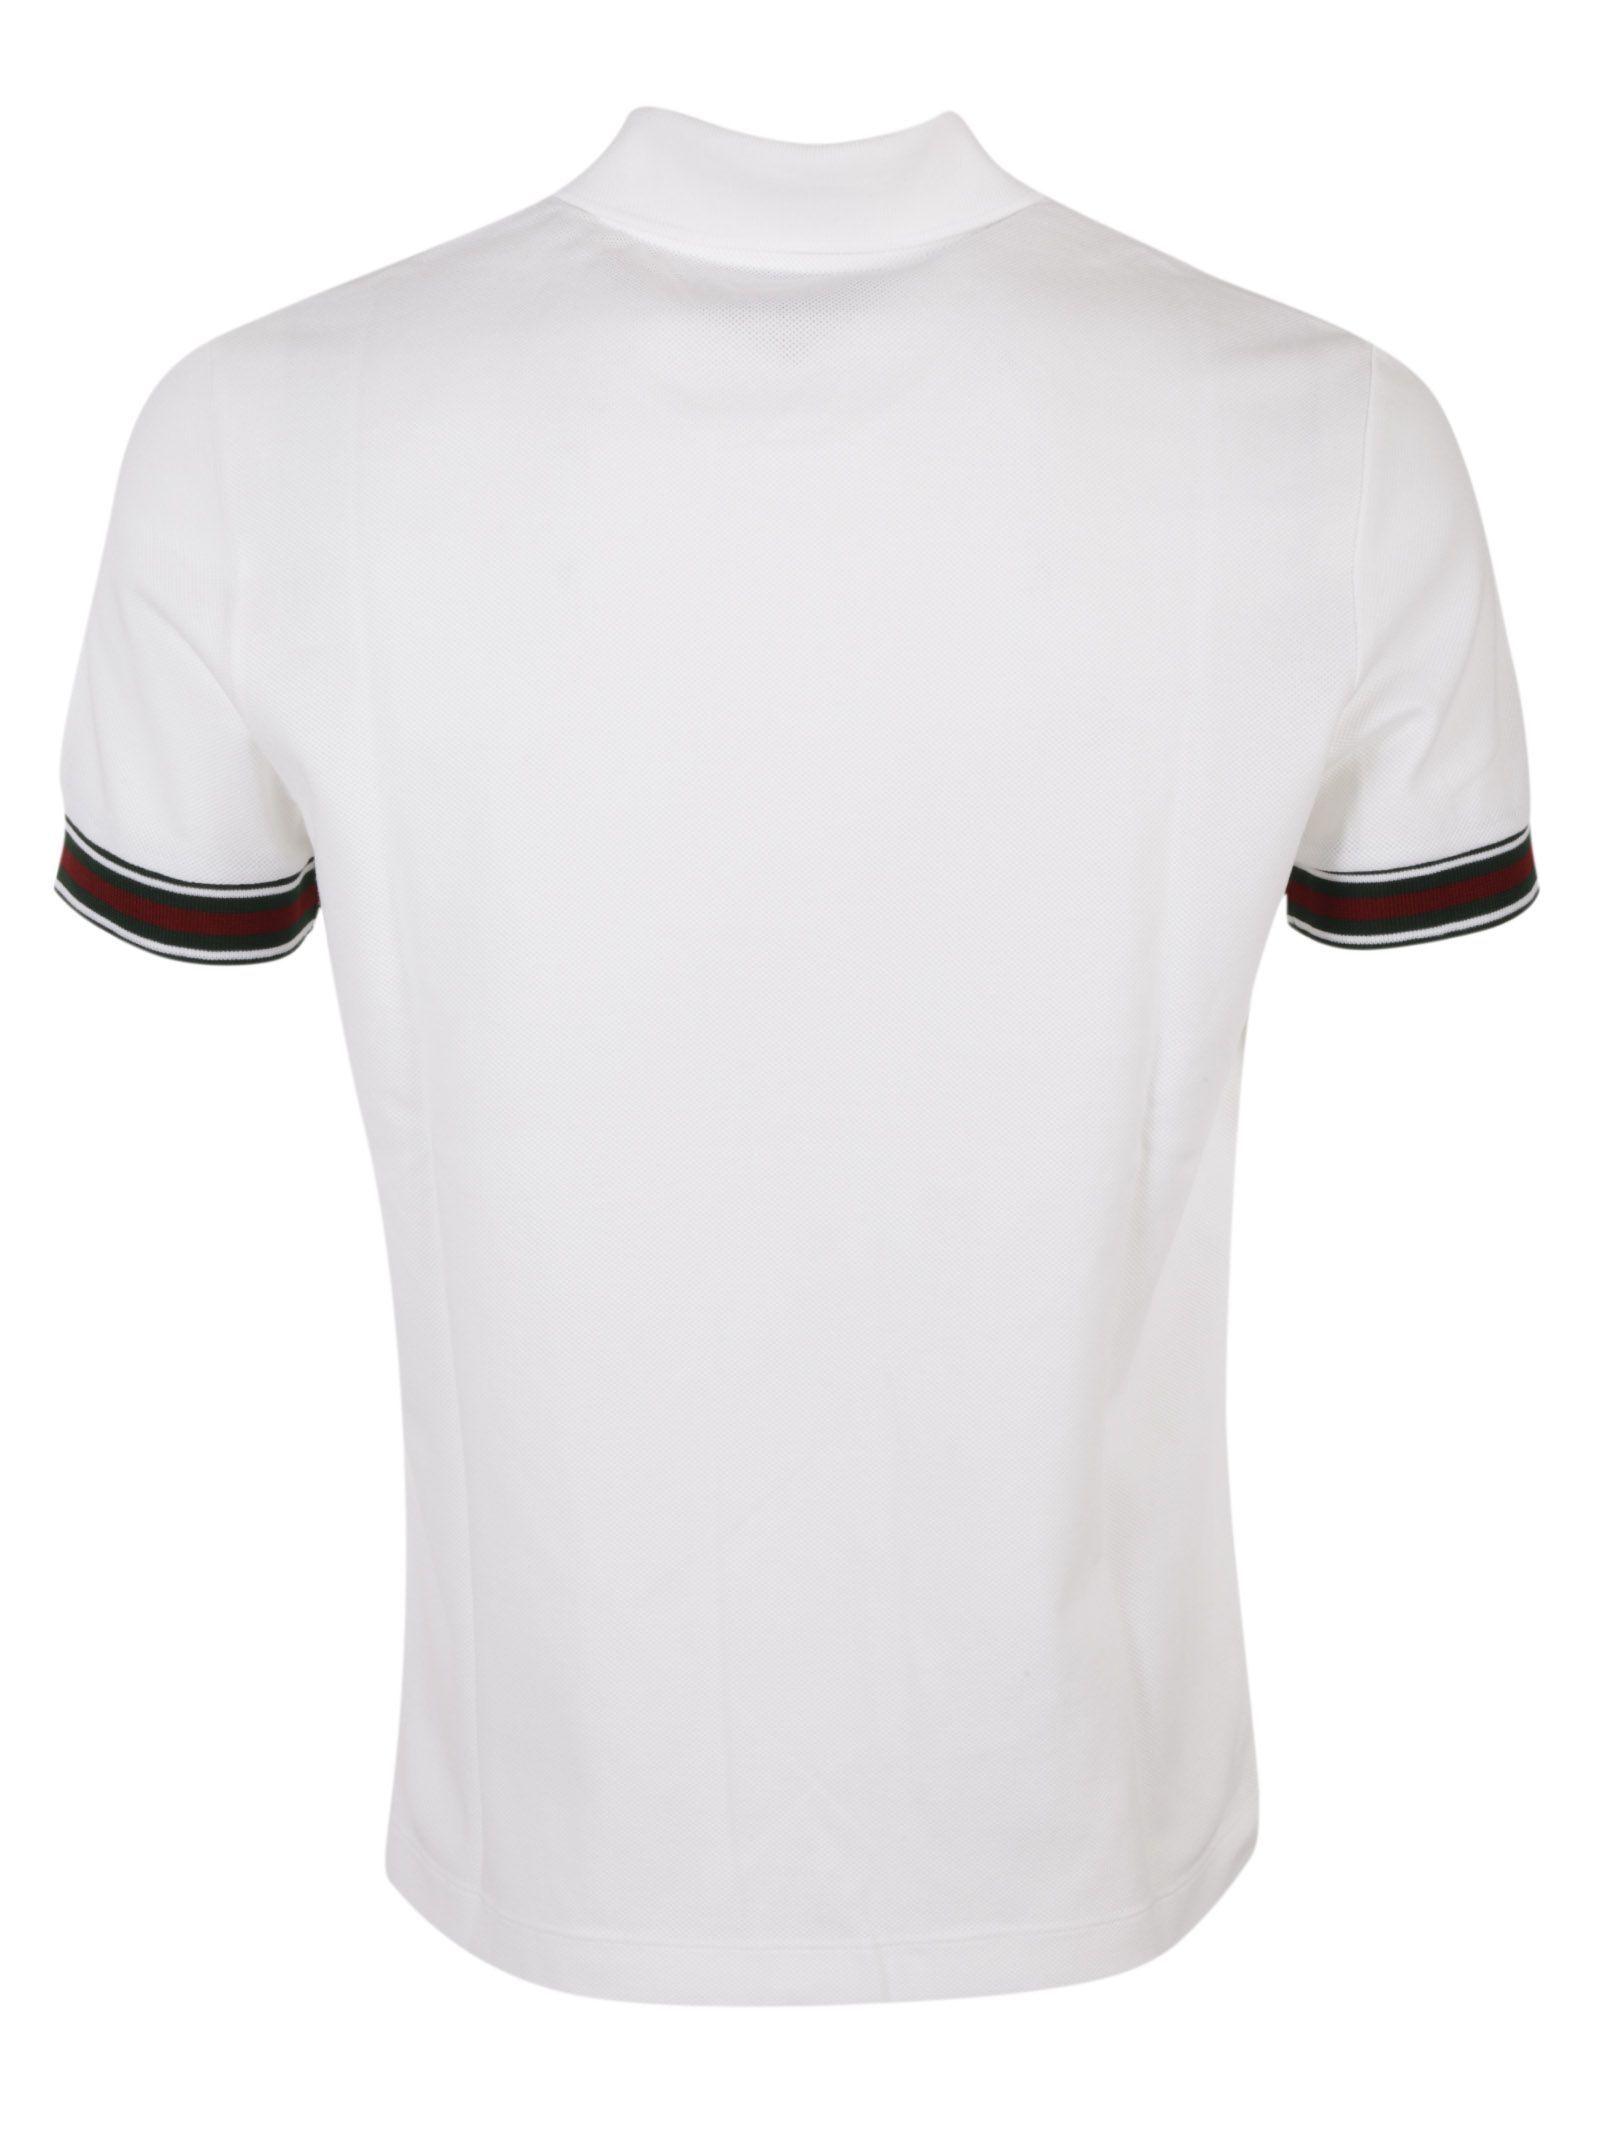 Sale 2016 gucci mens polo shirt popular buyma for Polo shirt men sale